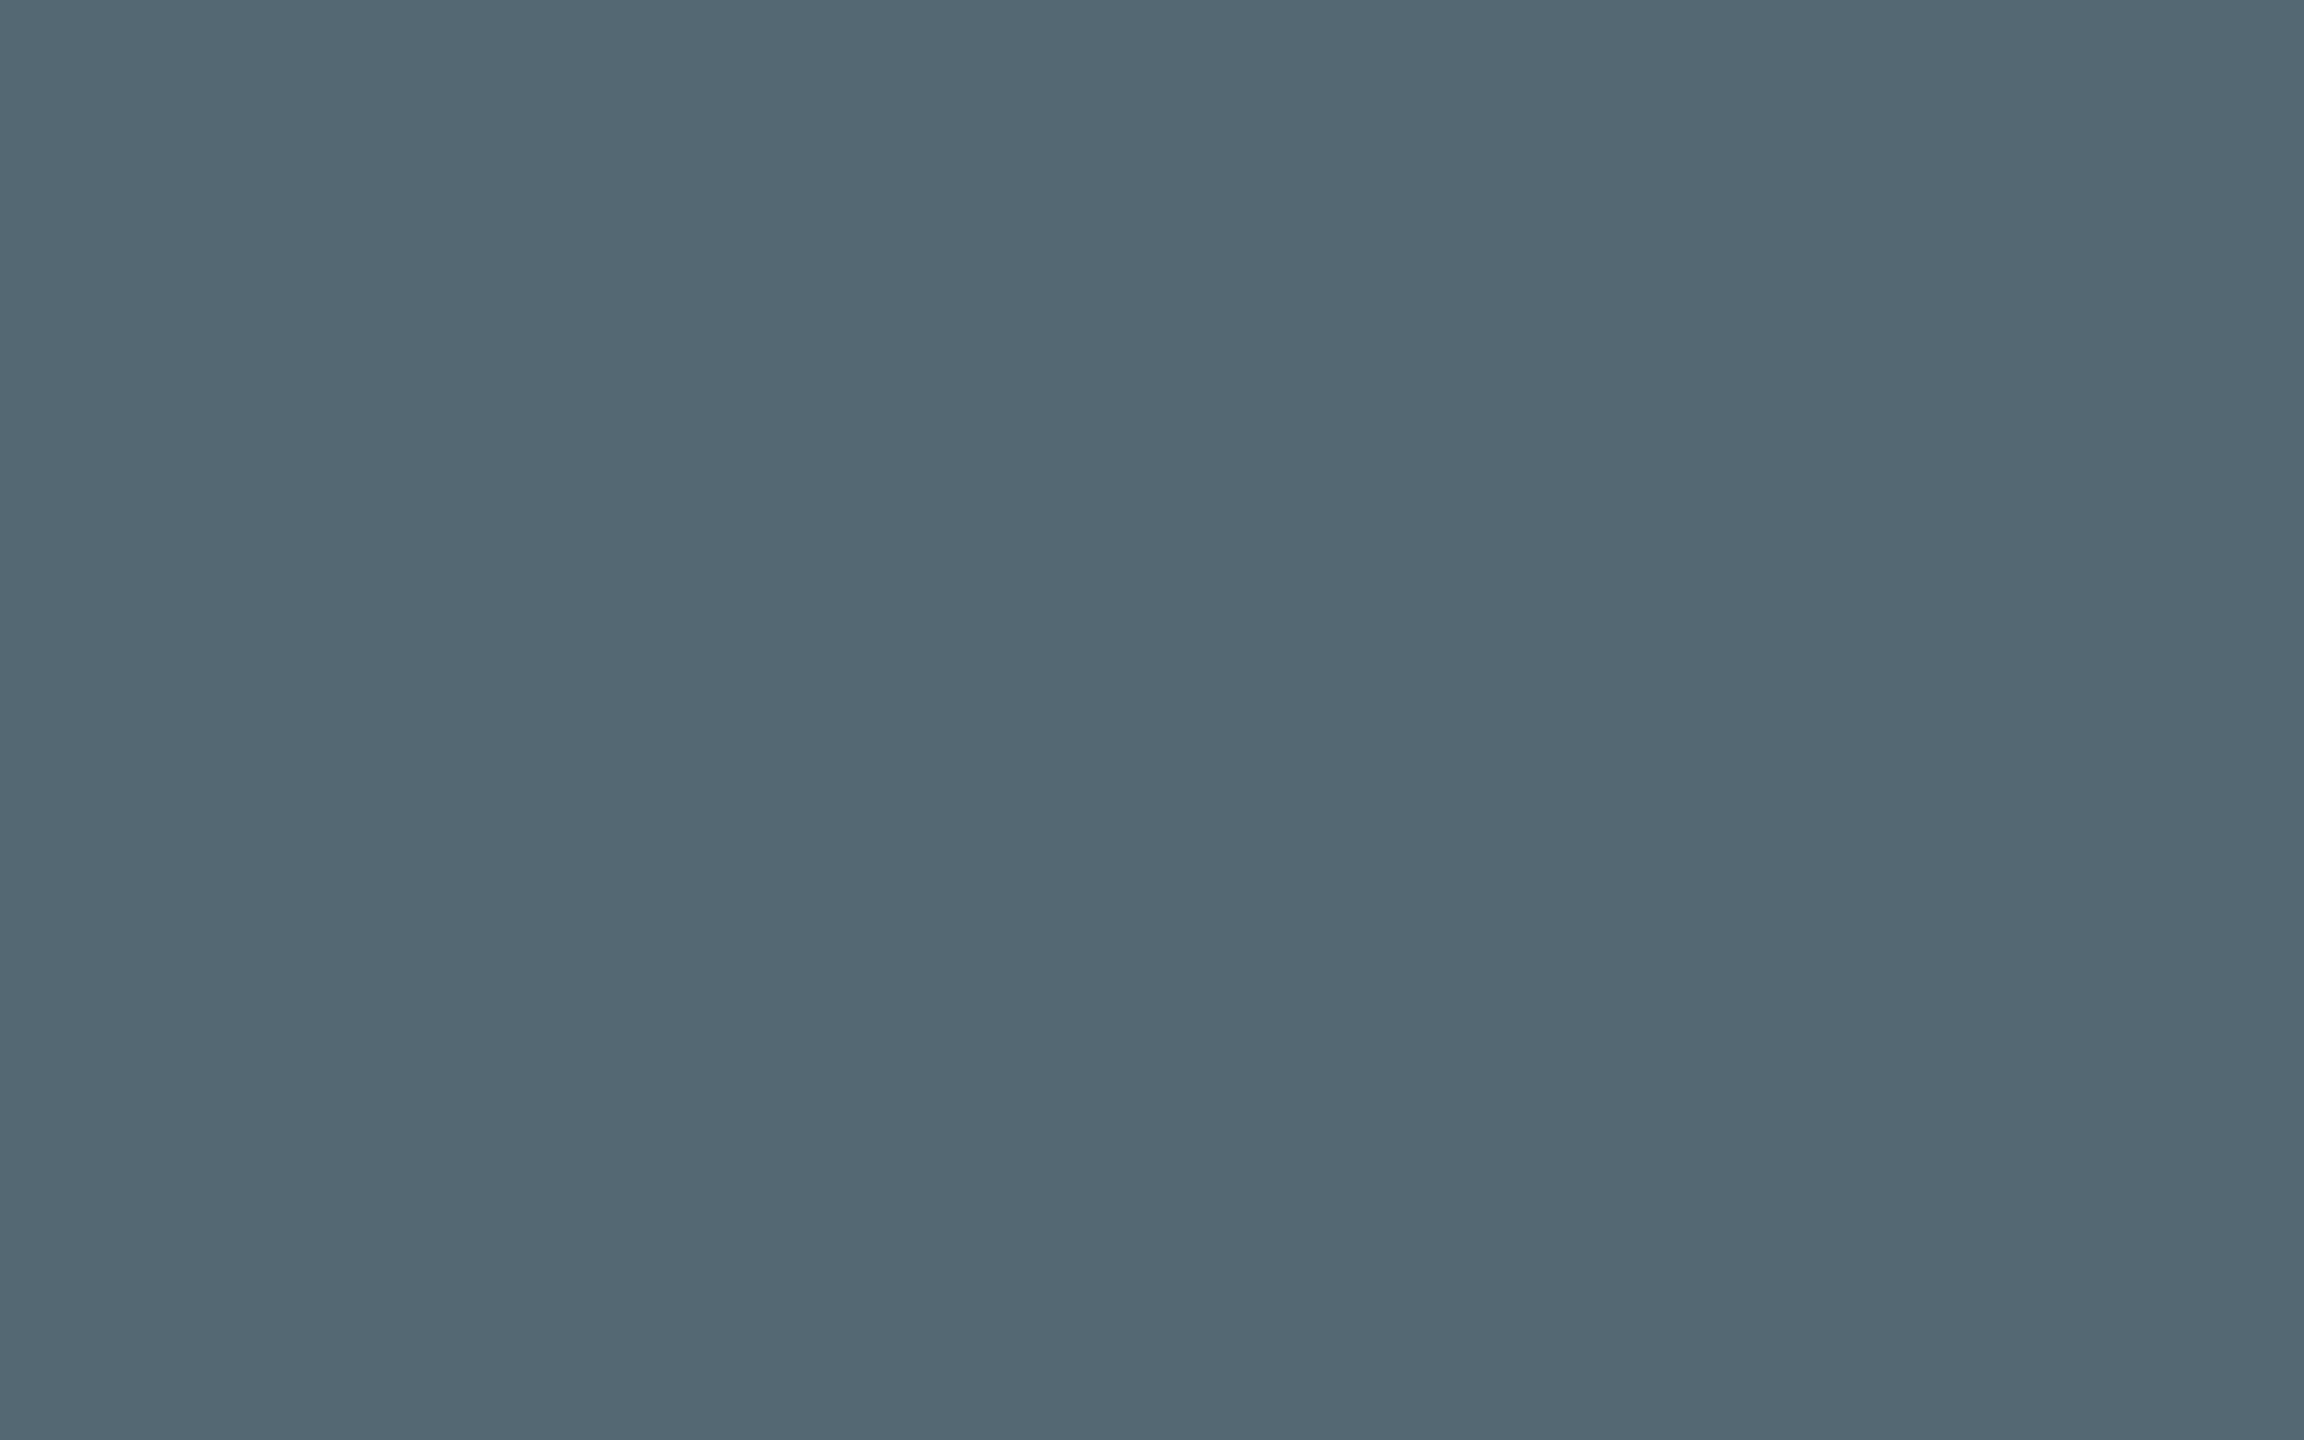 2304x1440 Cadet Solid Color Background